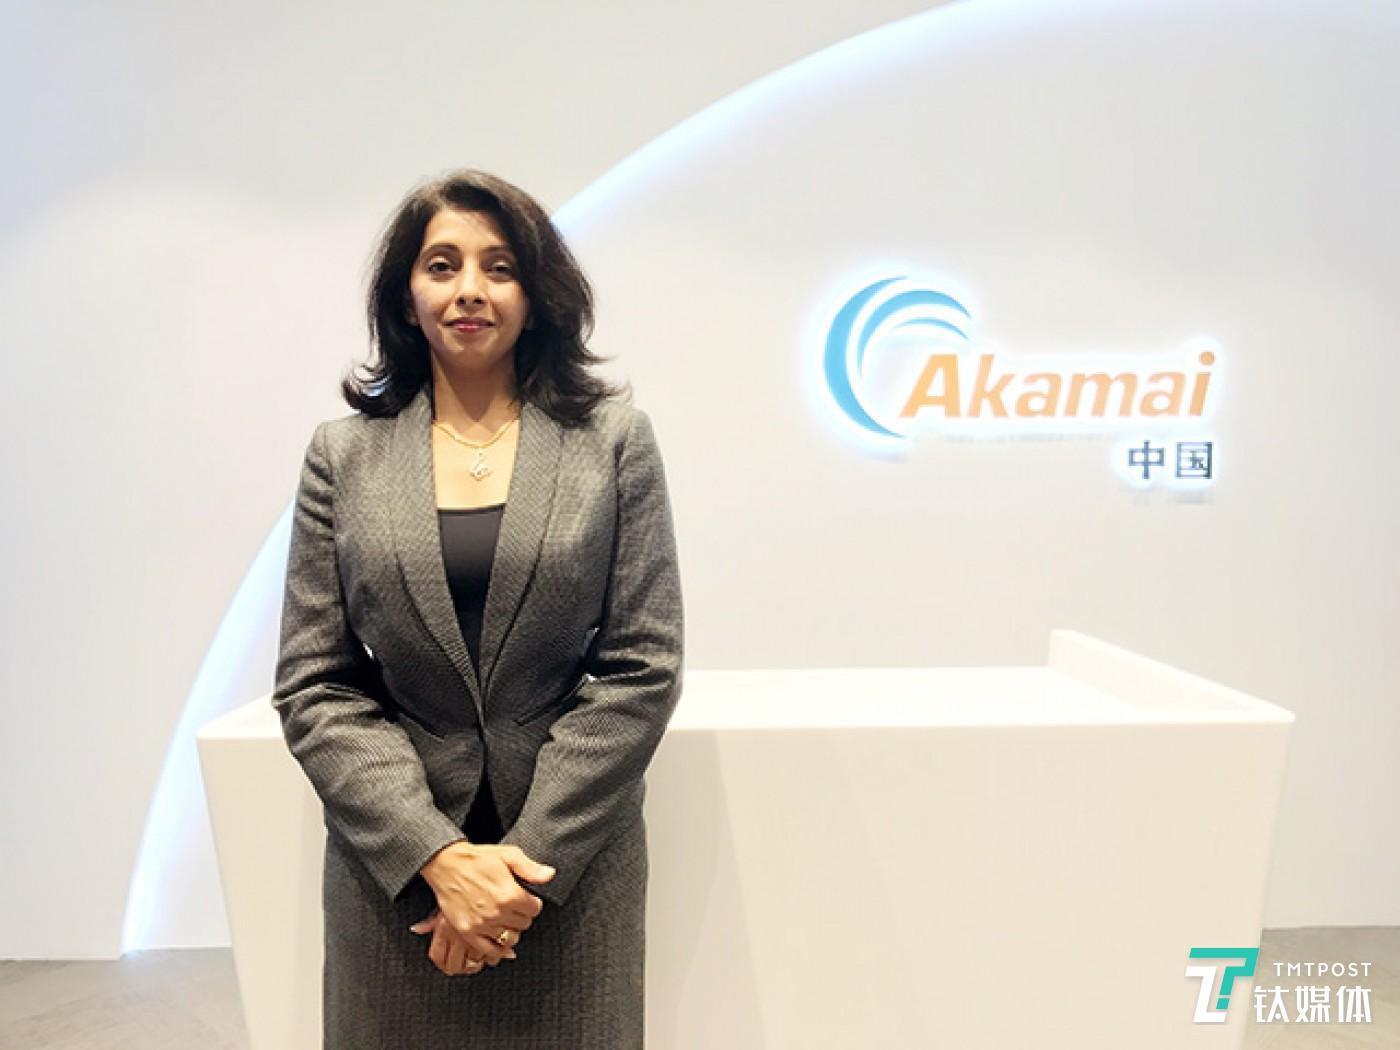 Akamai Web业务部全球售前副总裁Maha Pula